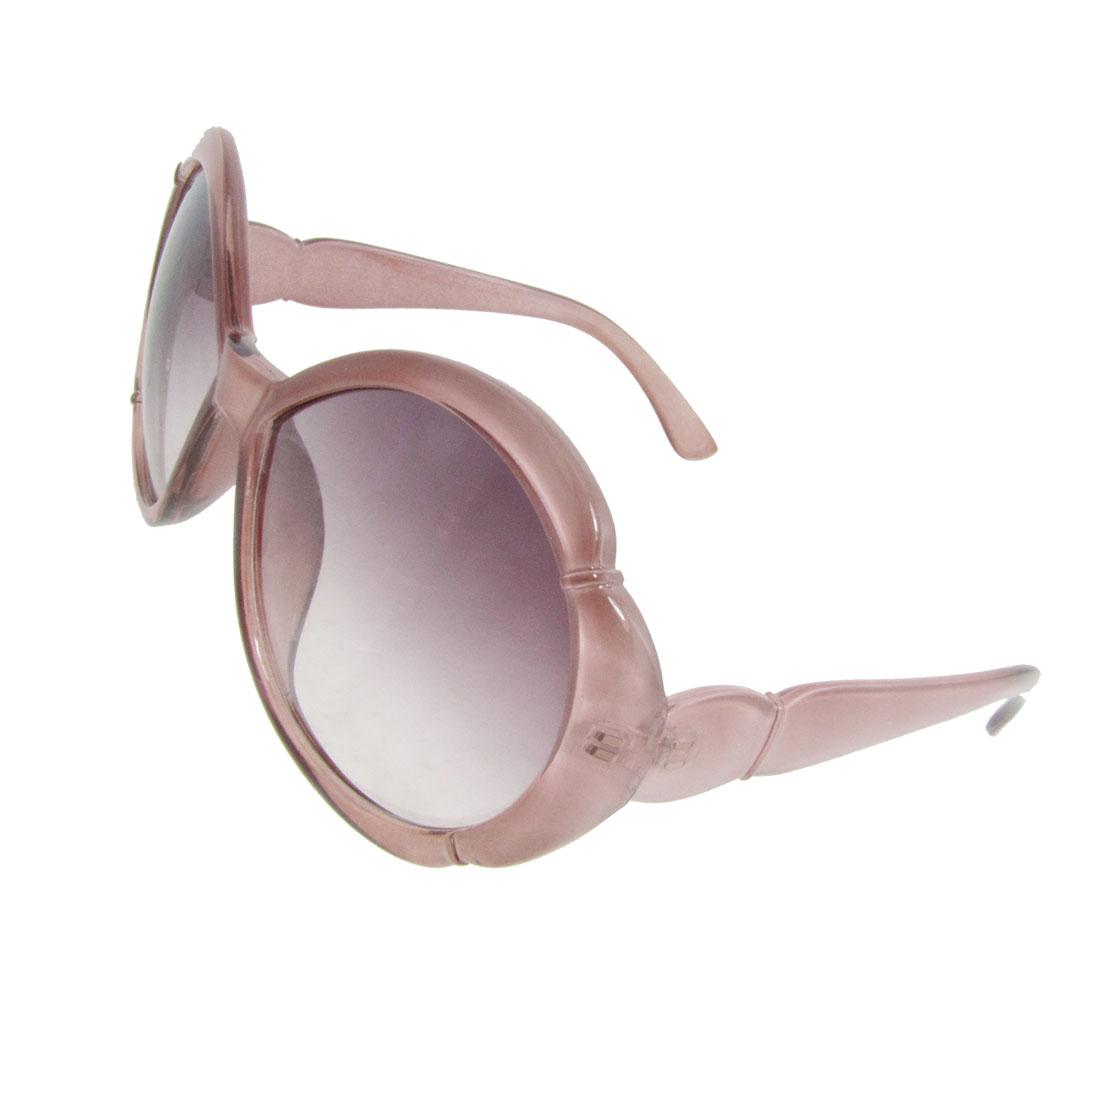 Woman Light Red Plastic Full Frame Circle Oversized Lens Sunglasses Spectacles